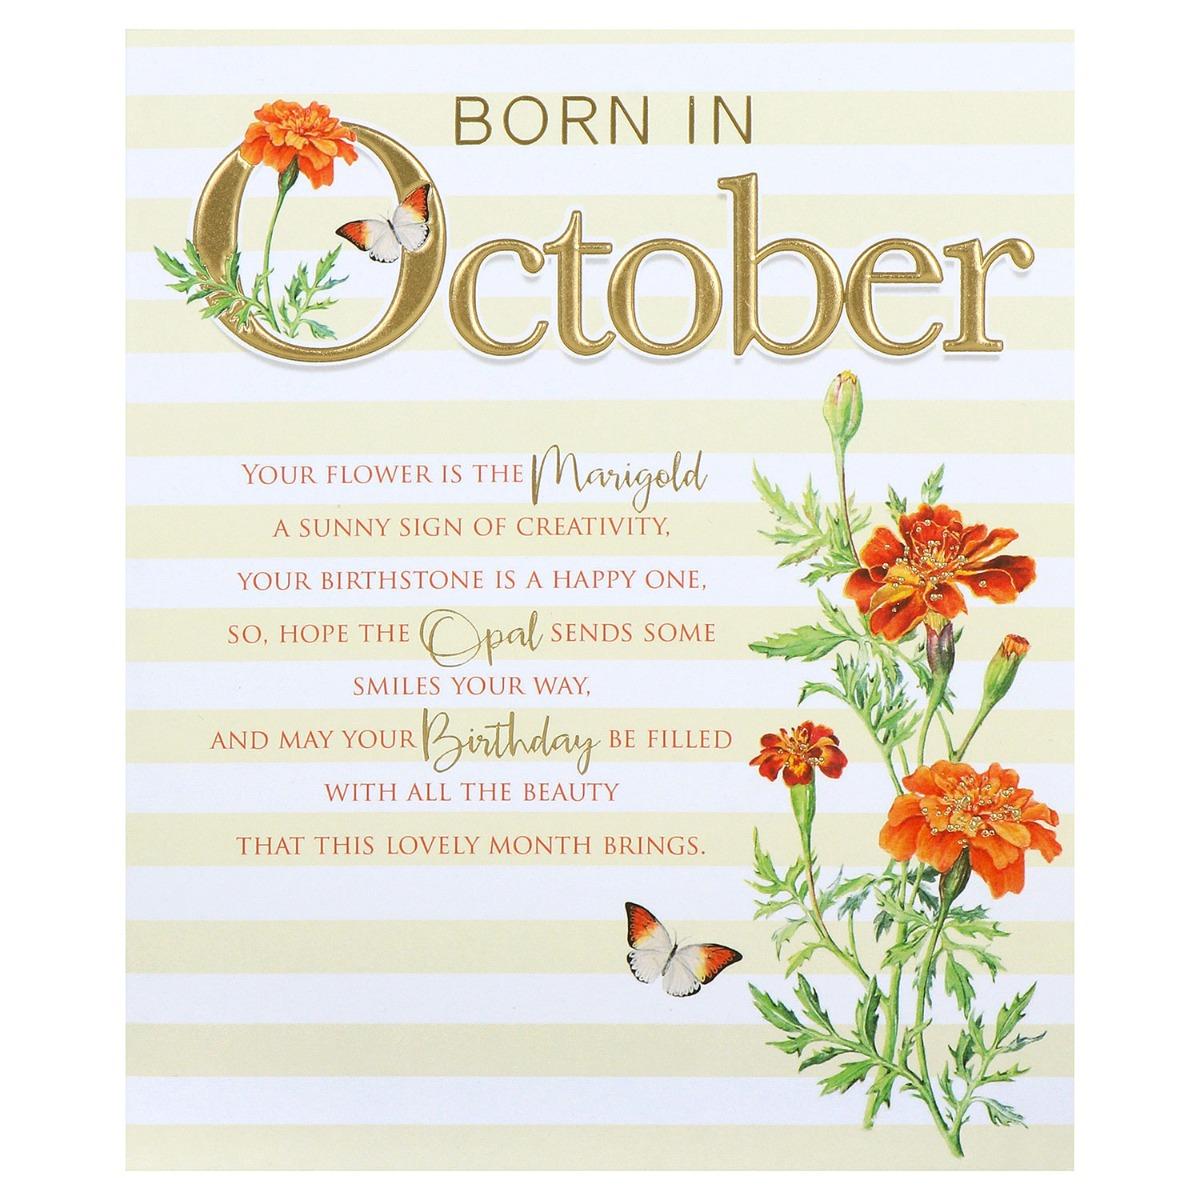 Floral 'Born in October' Birthday Card